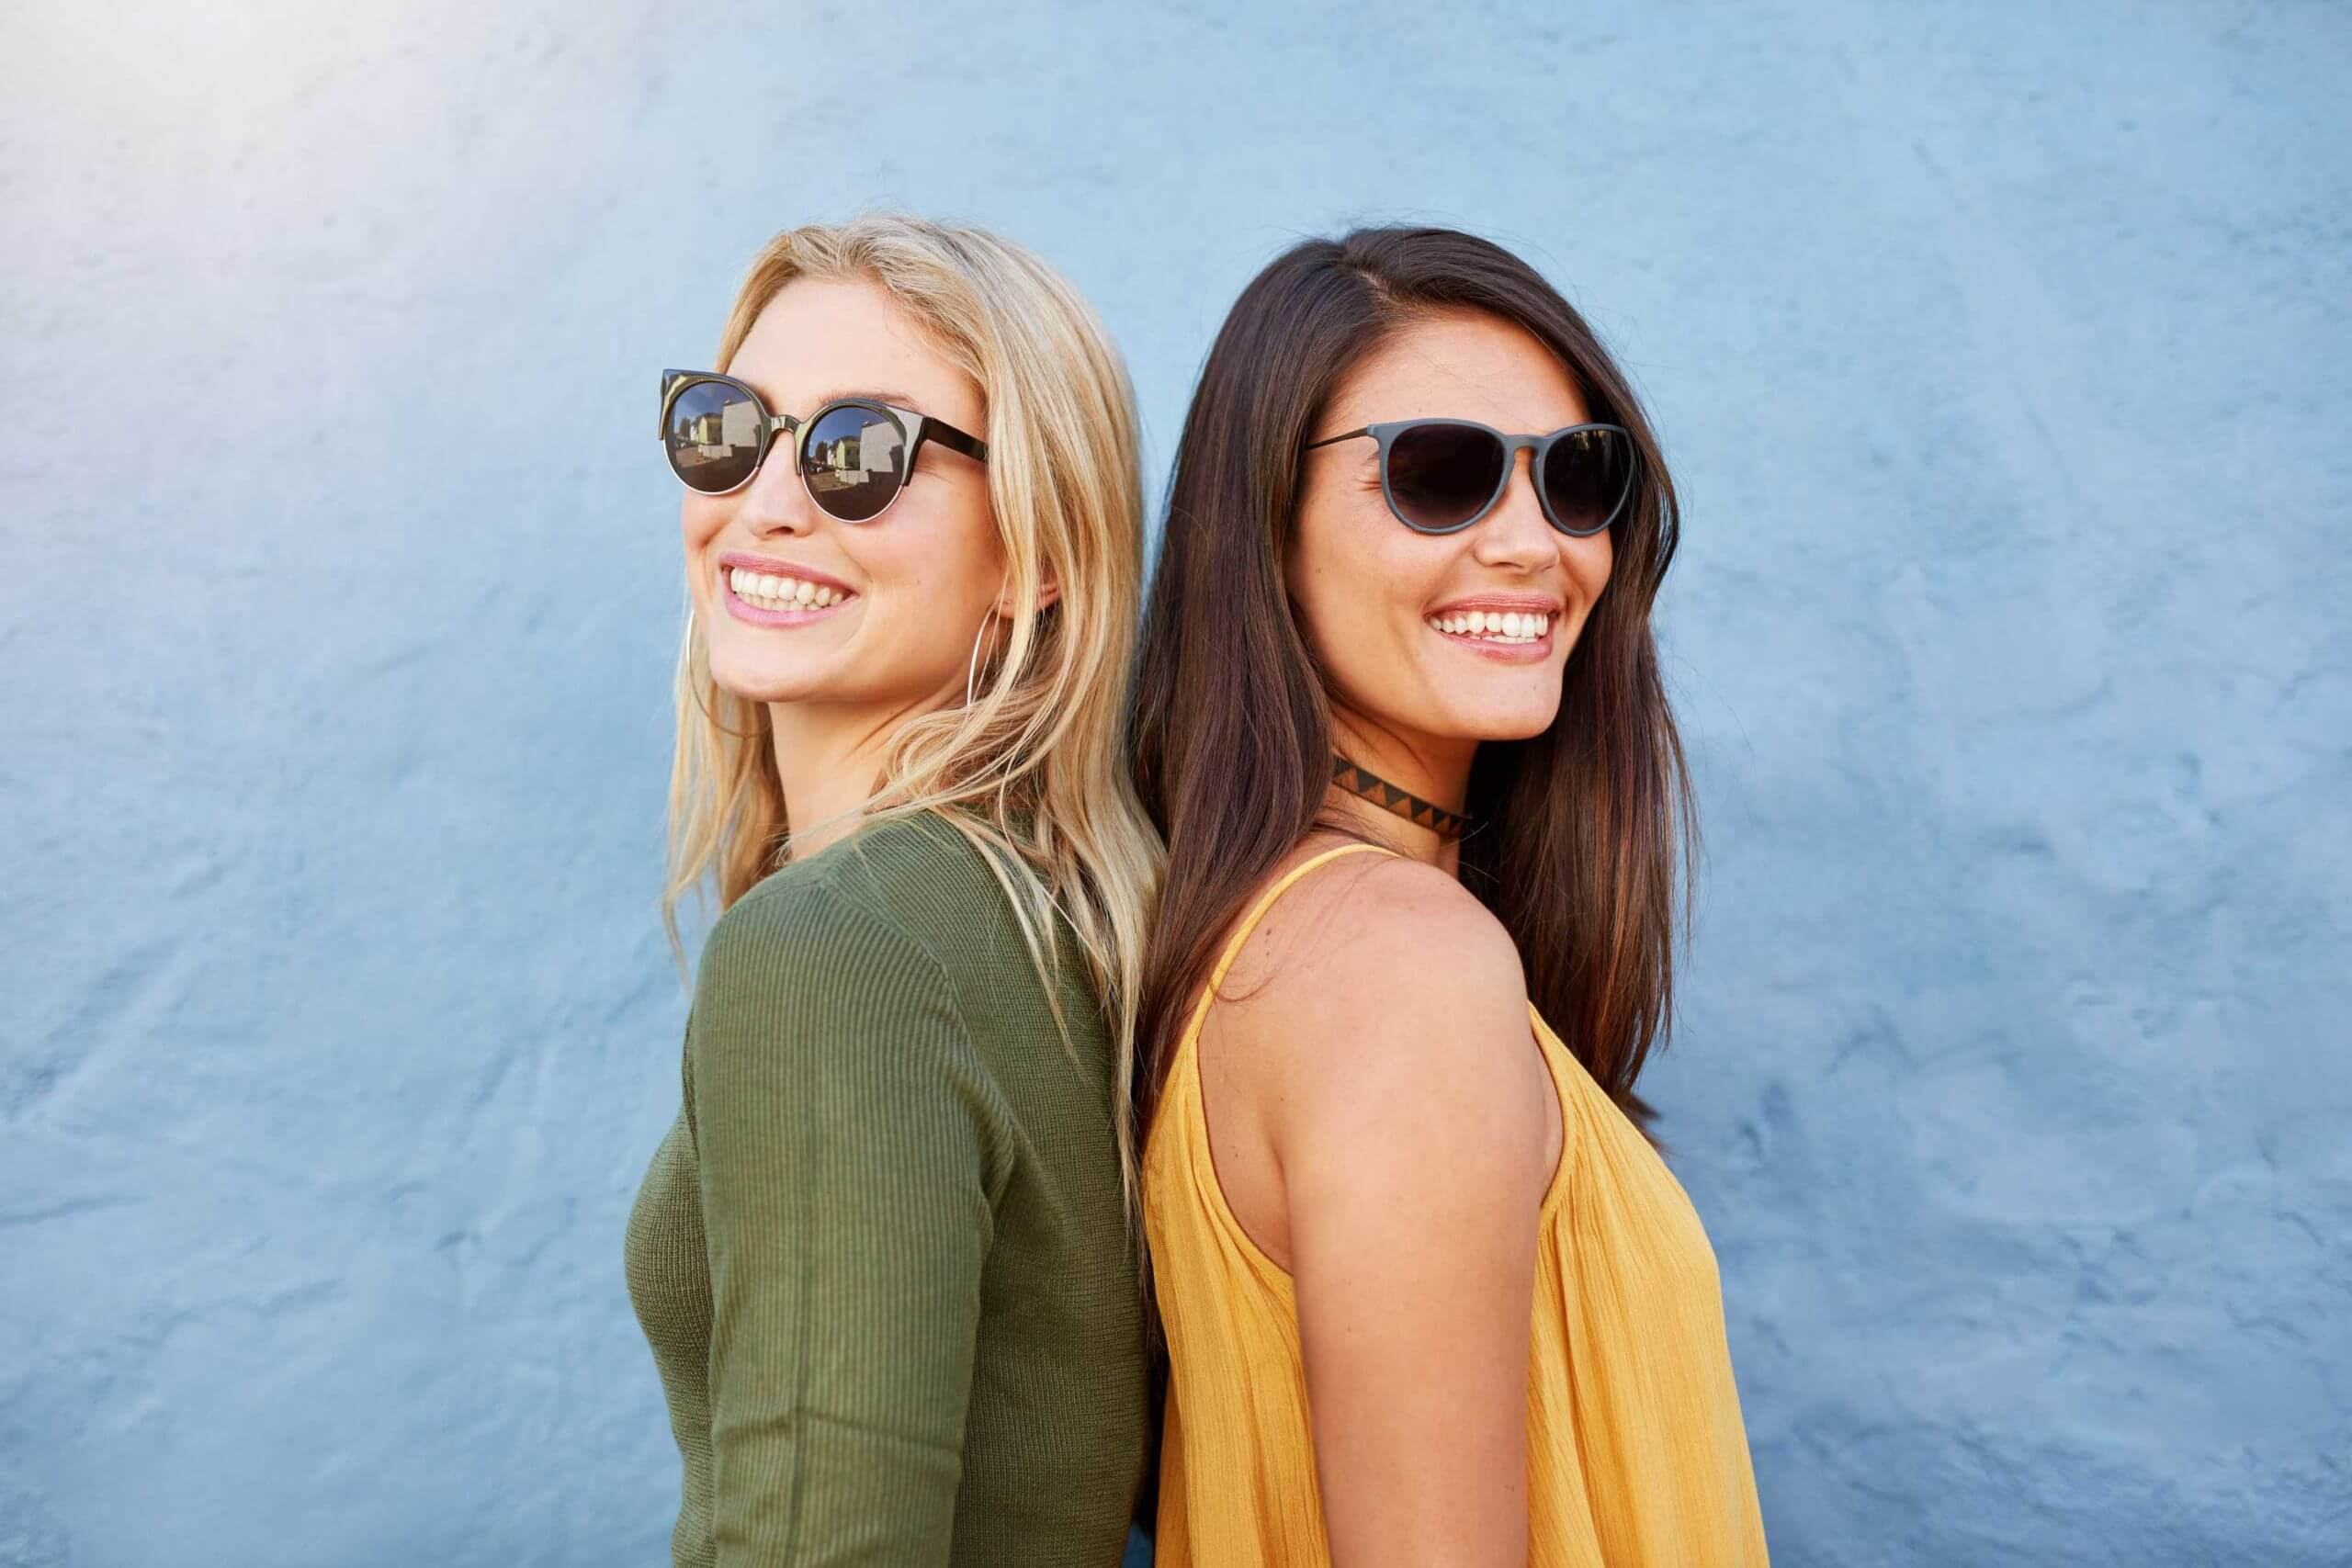 stylish-female-friends-wearing-sunglasses-PNAXR42_web2-scaled